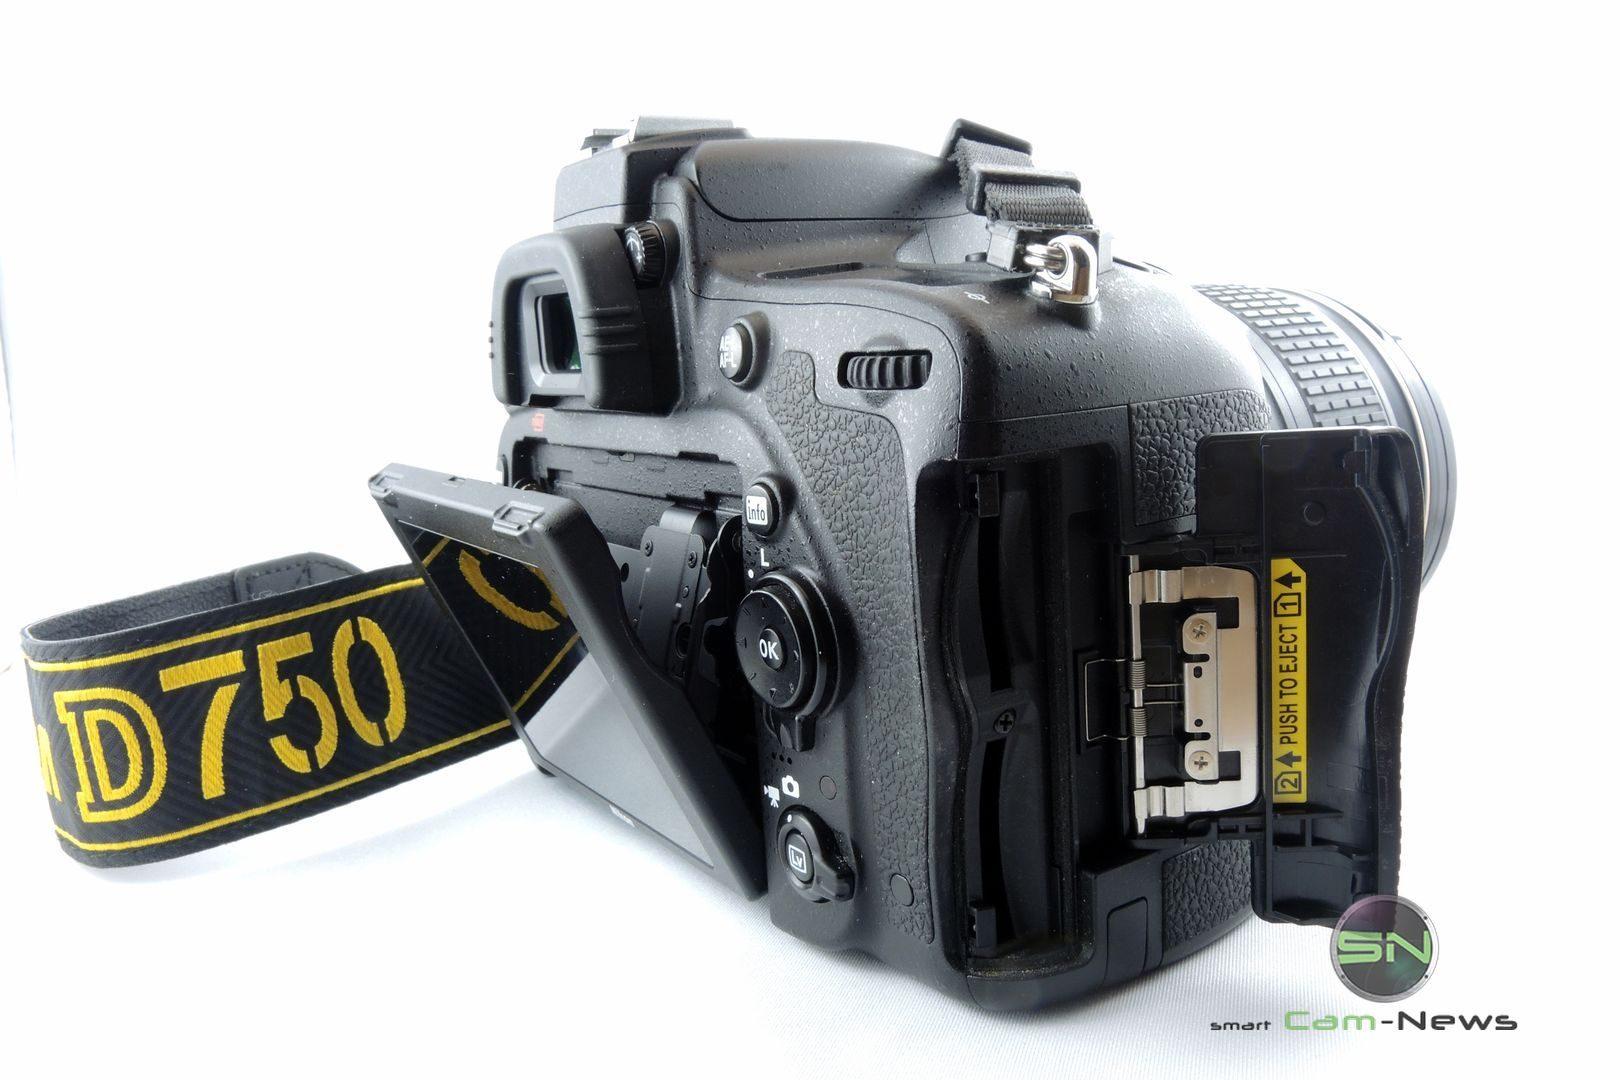 doppelter SD Schacht - Nikon D750 - SmartCamNews